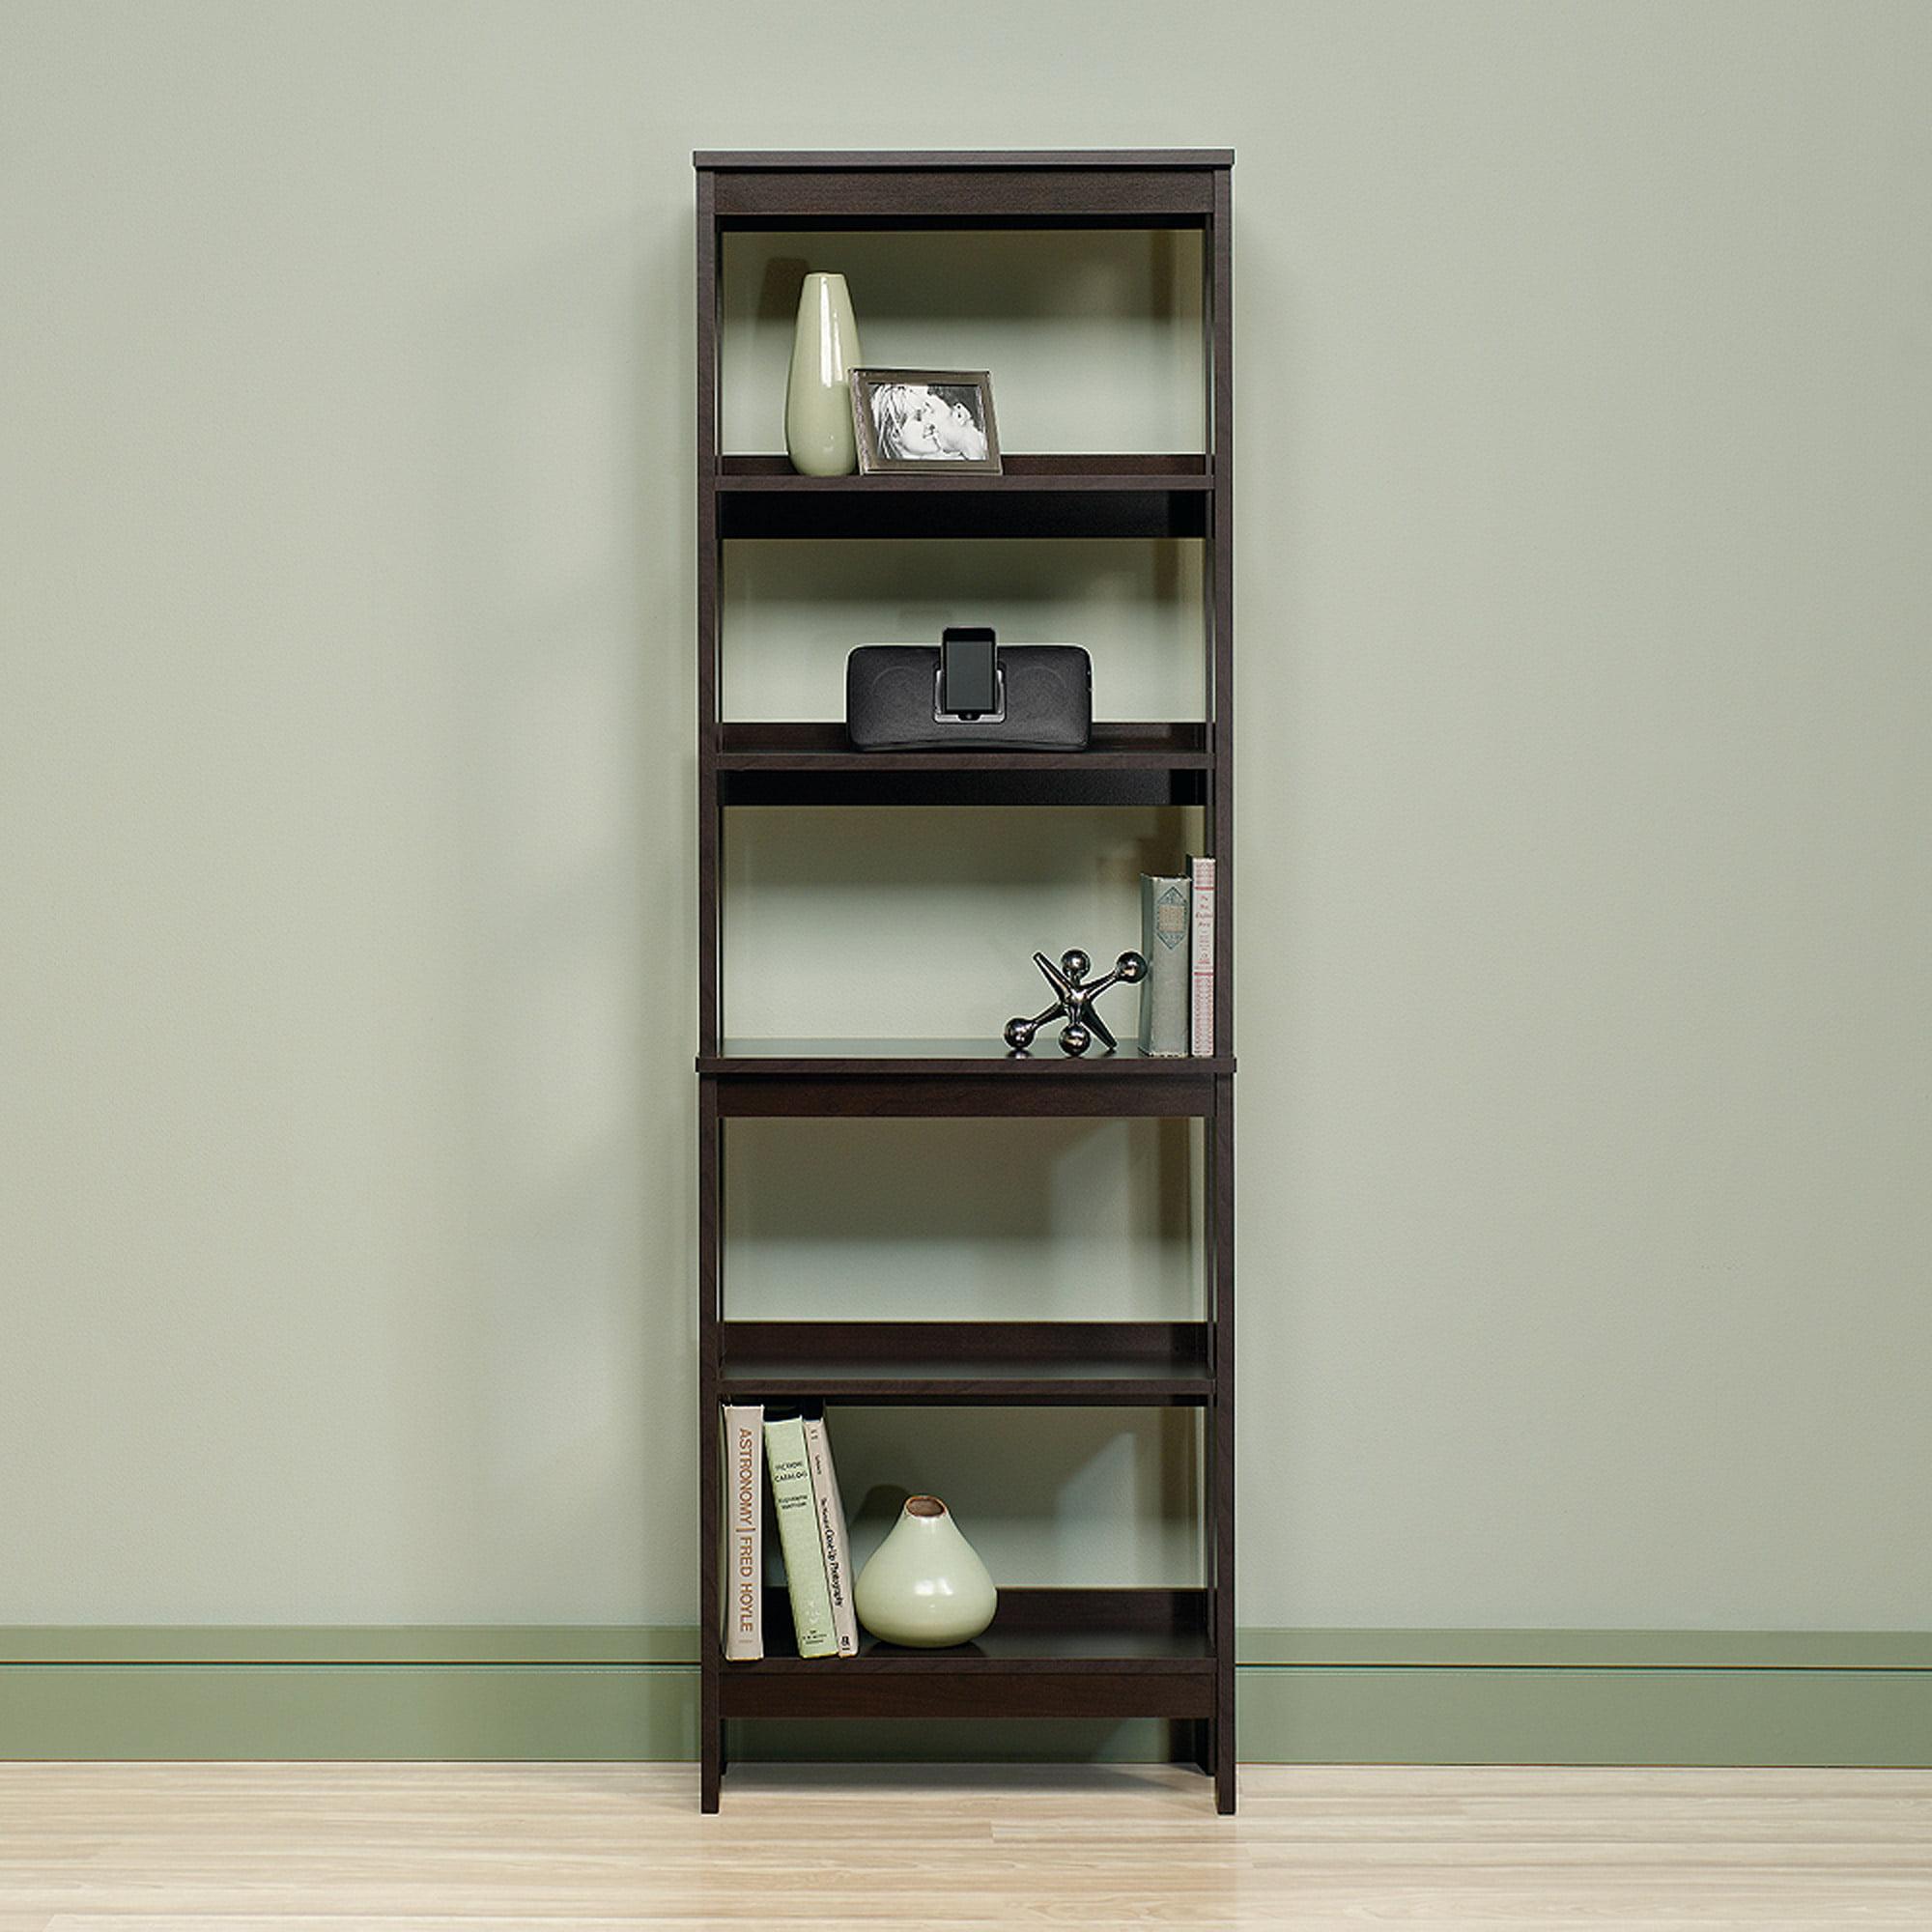 Sauder Beginnings 5 Shelf Bookcase, Cinnamon Cherry Finish   Walmart.com